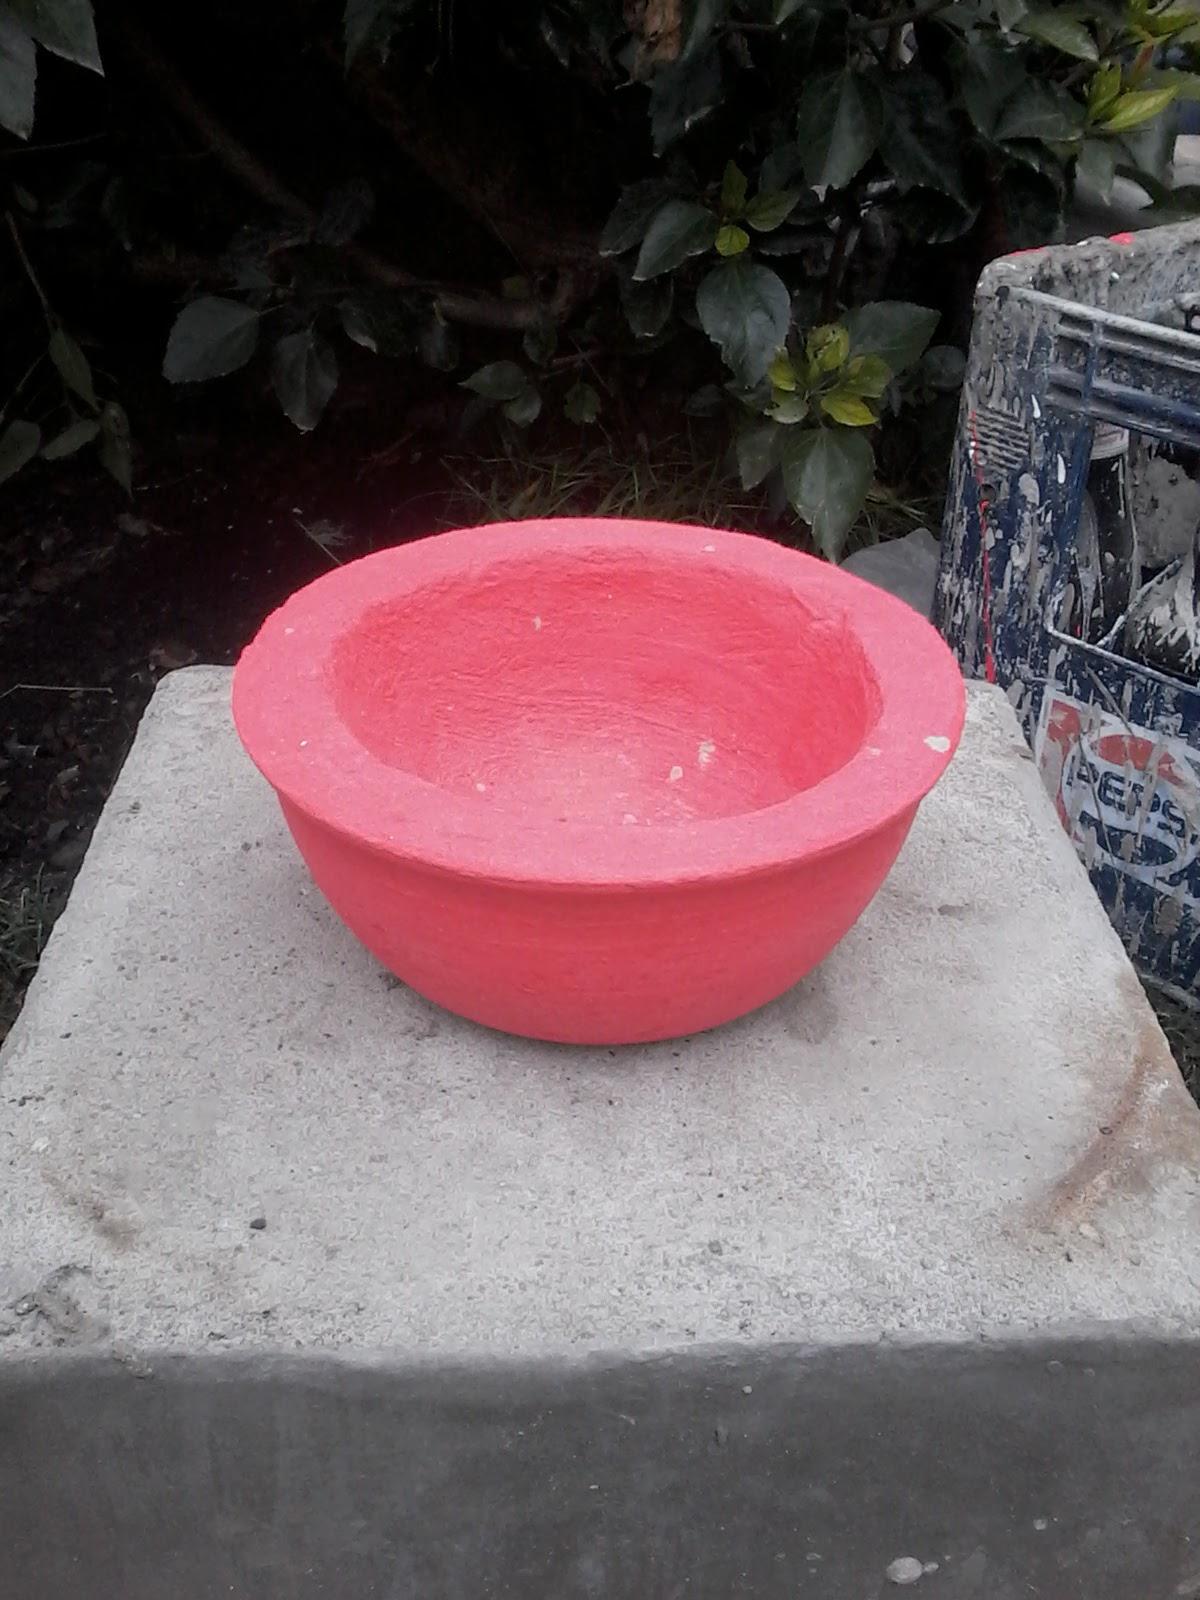 Moldes para hacer macetas de cemento o hacer los moldes - Moldes de cemento ...